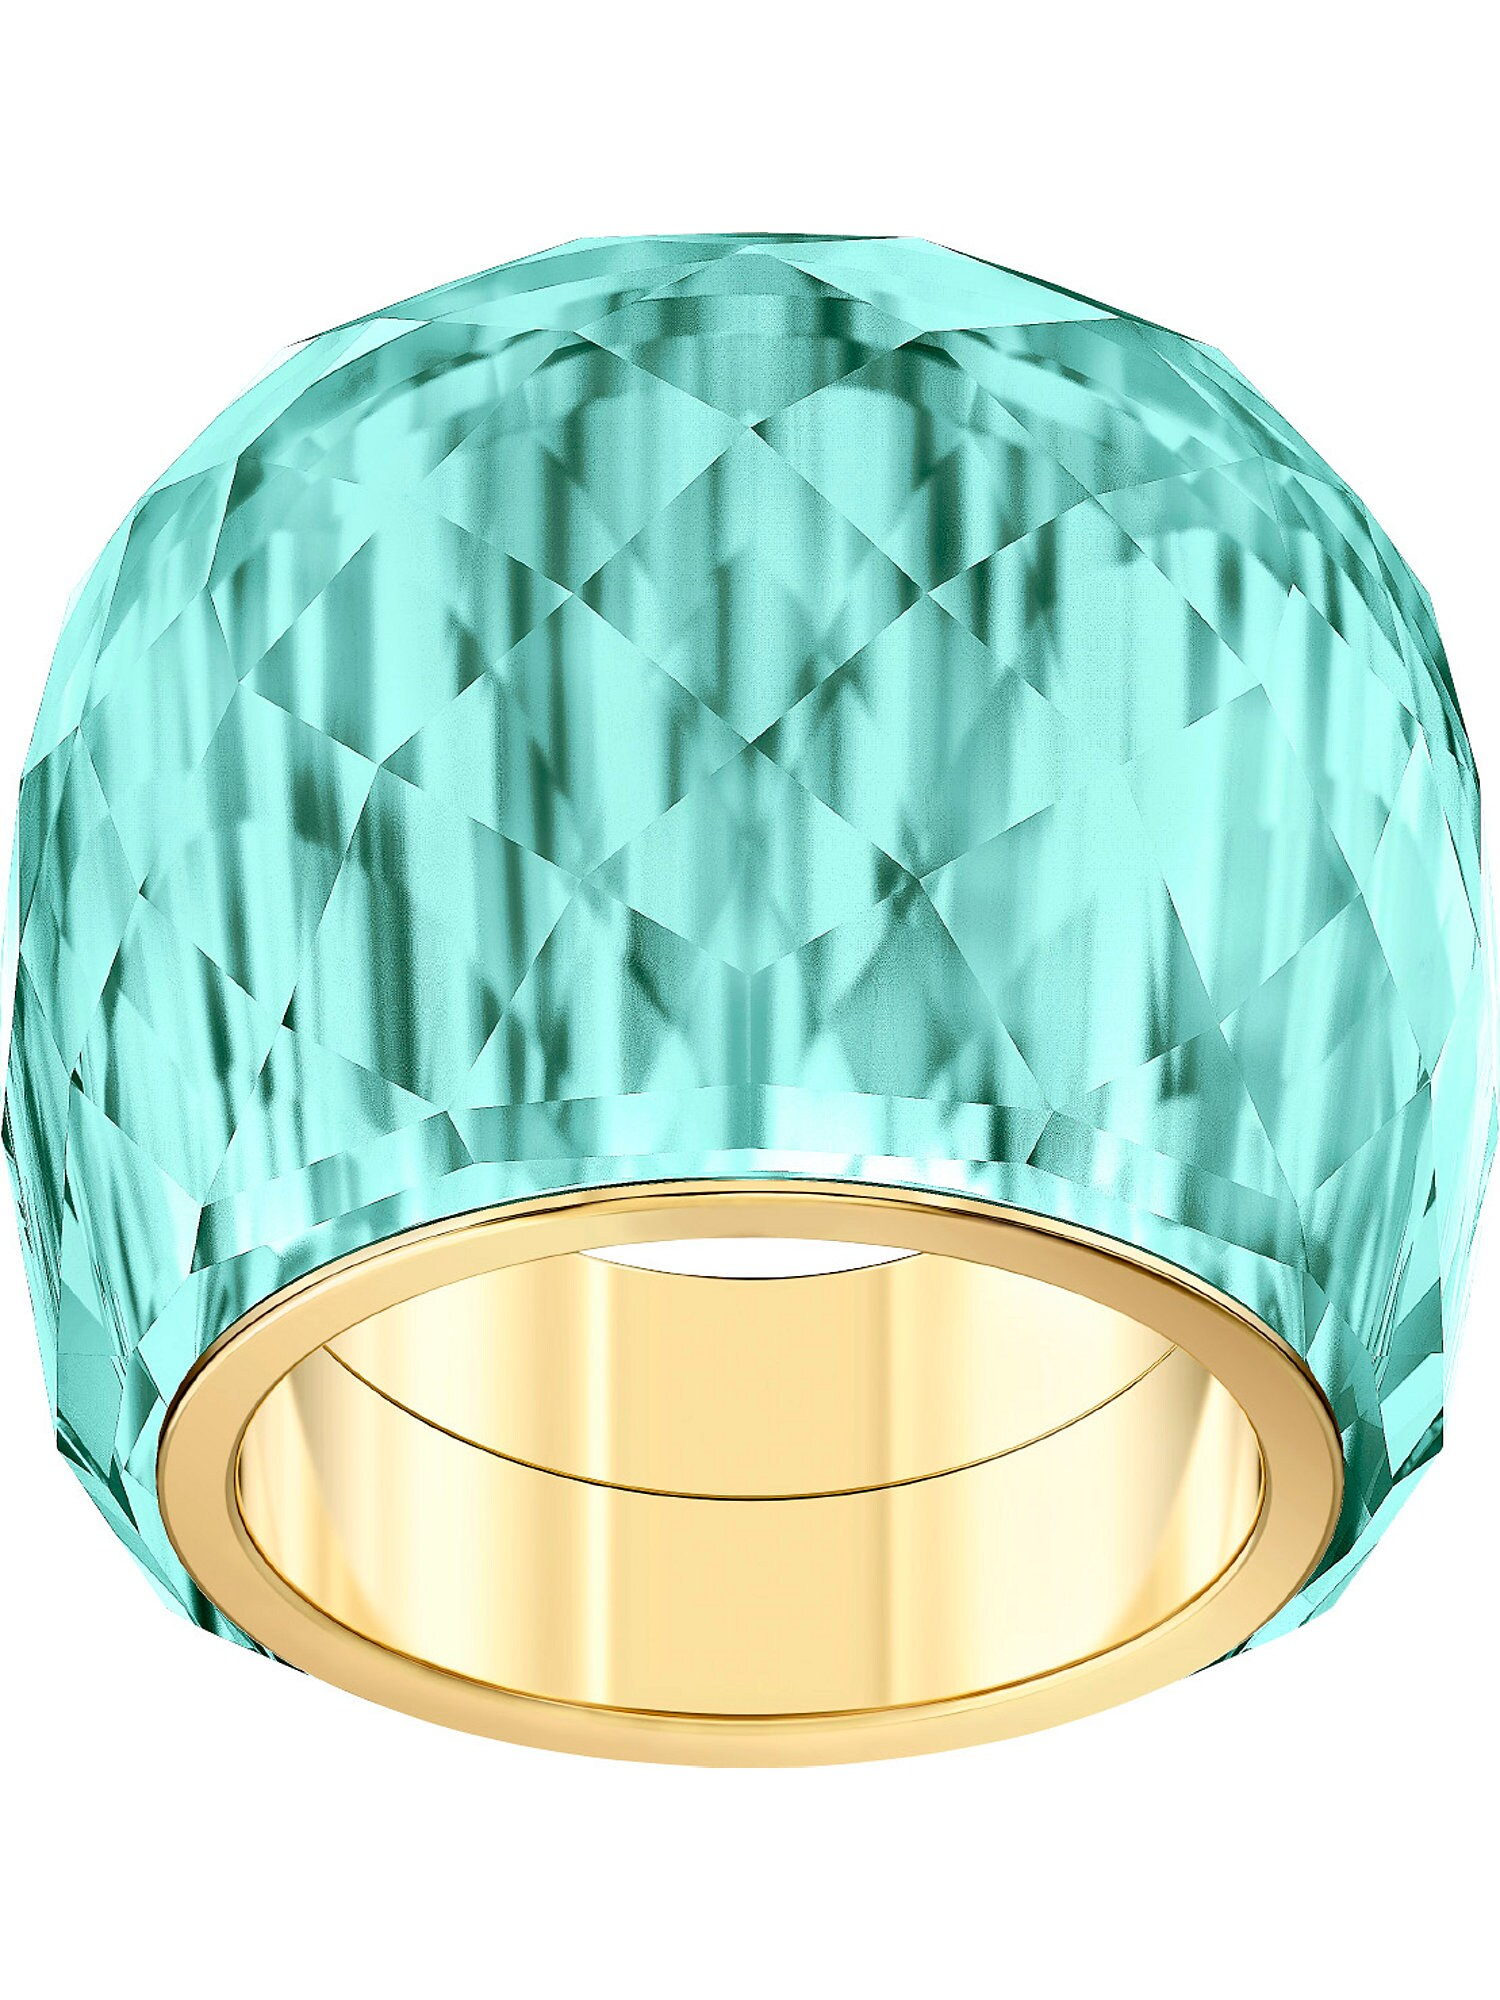 Damen Swarovski Ring 'Nirvana' blau,  gold, gold,  türkis, grau,  silber, silber | 09009654322064